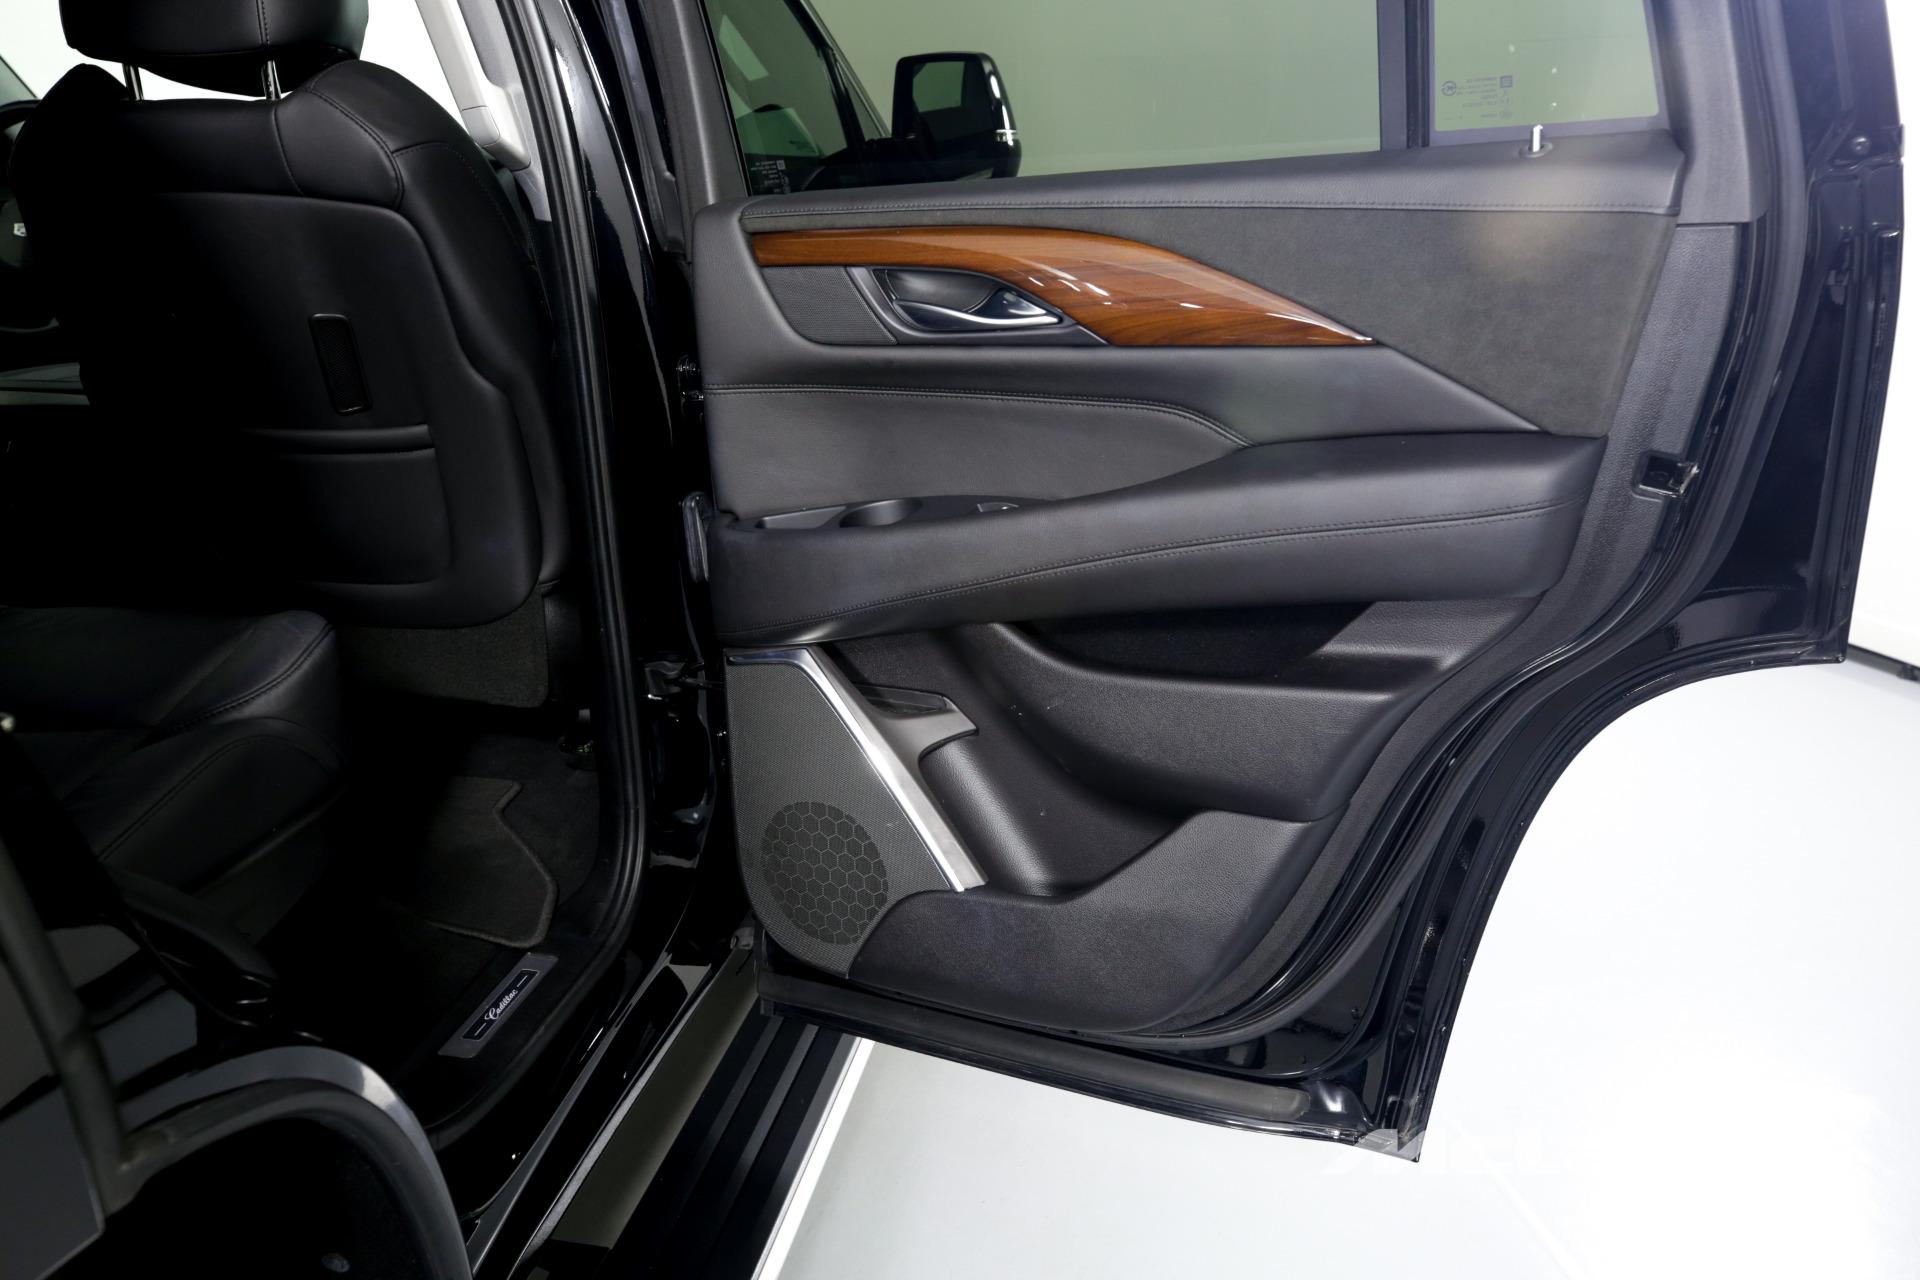 Used 2018 Cadillac Escalade Premium Luxury   Charlotte, NC